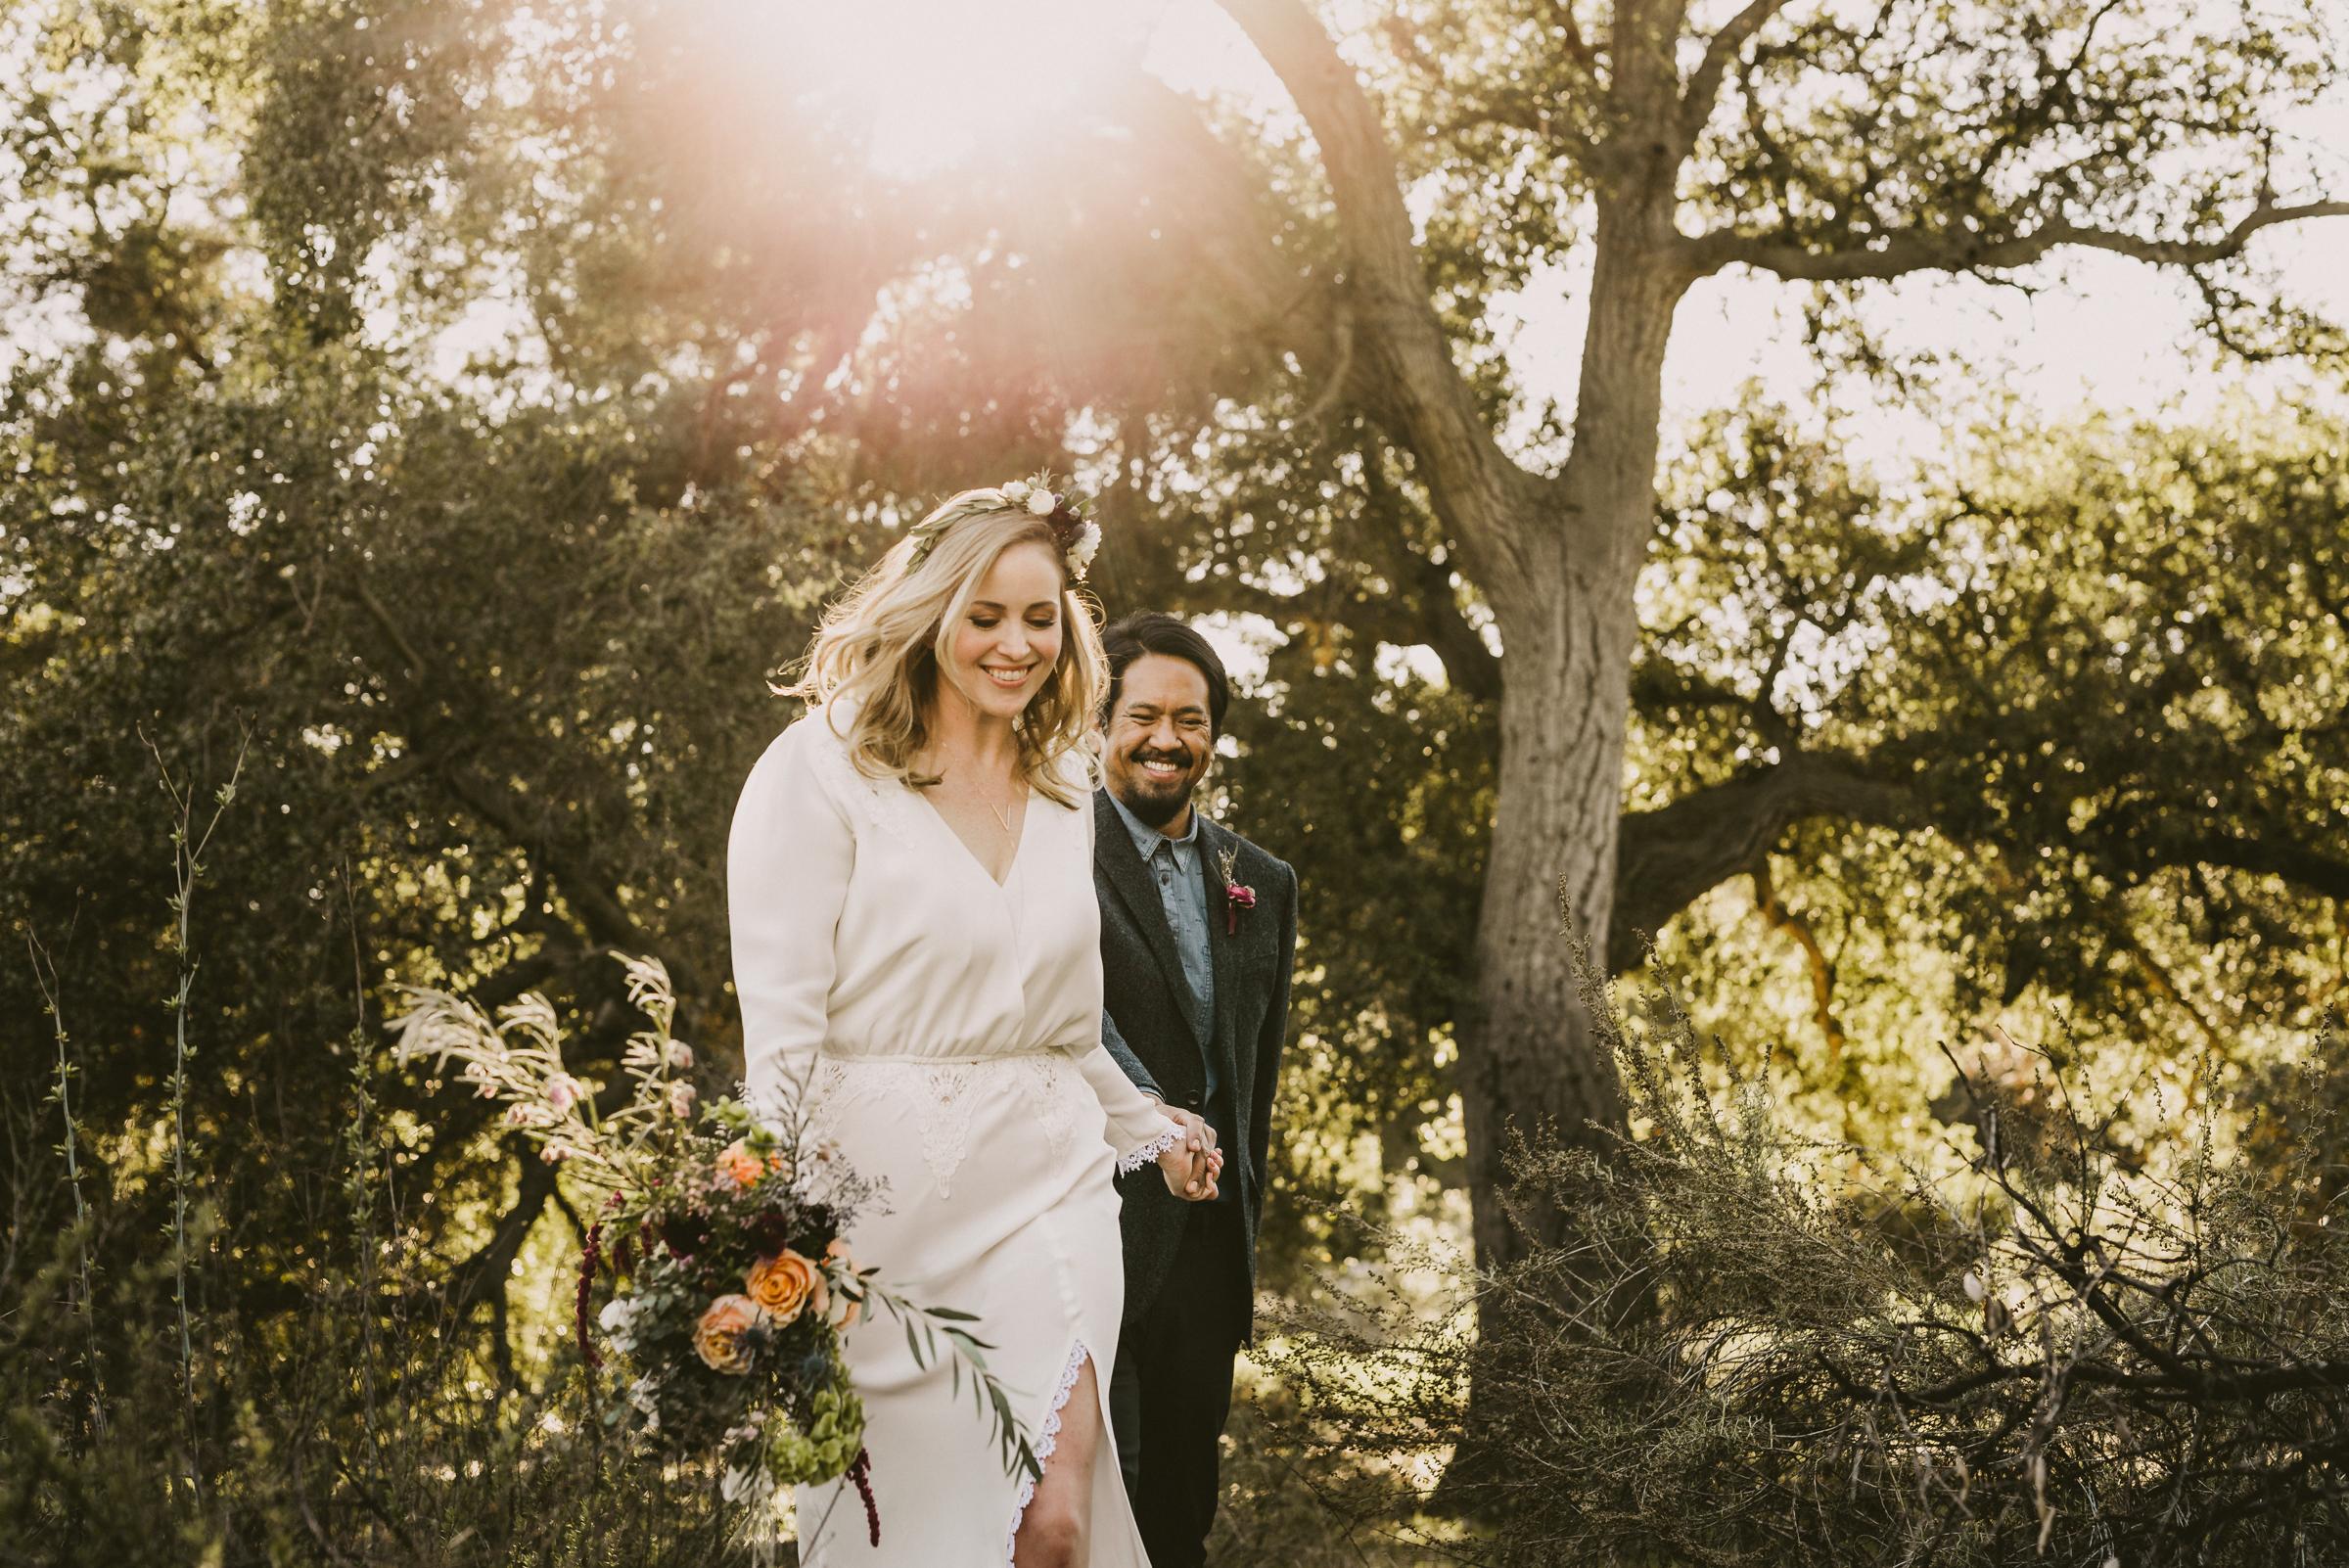 ©Isaiah + Taylor Photography - Intimate Elopement, Eaton Canyon, Los Angeles Wedding Photographer-29.jpg